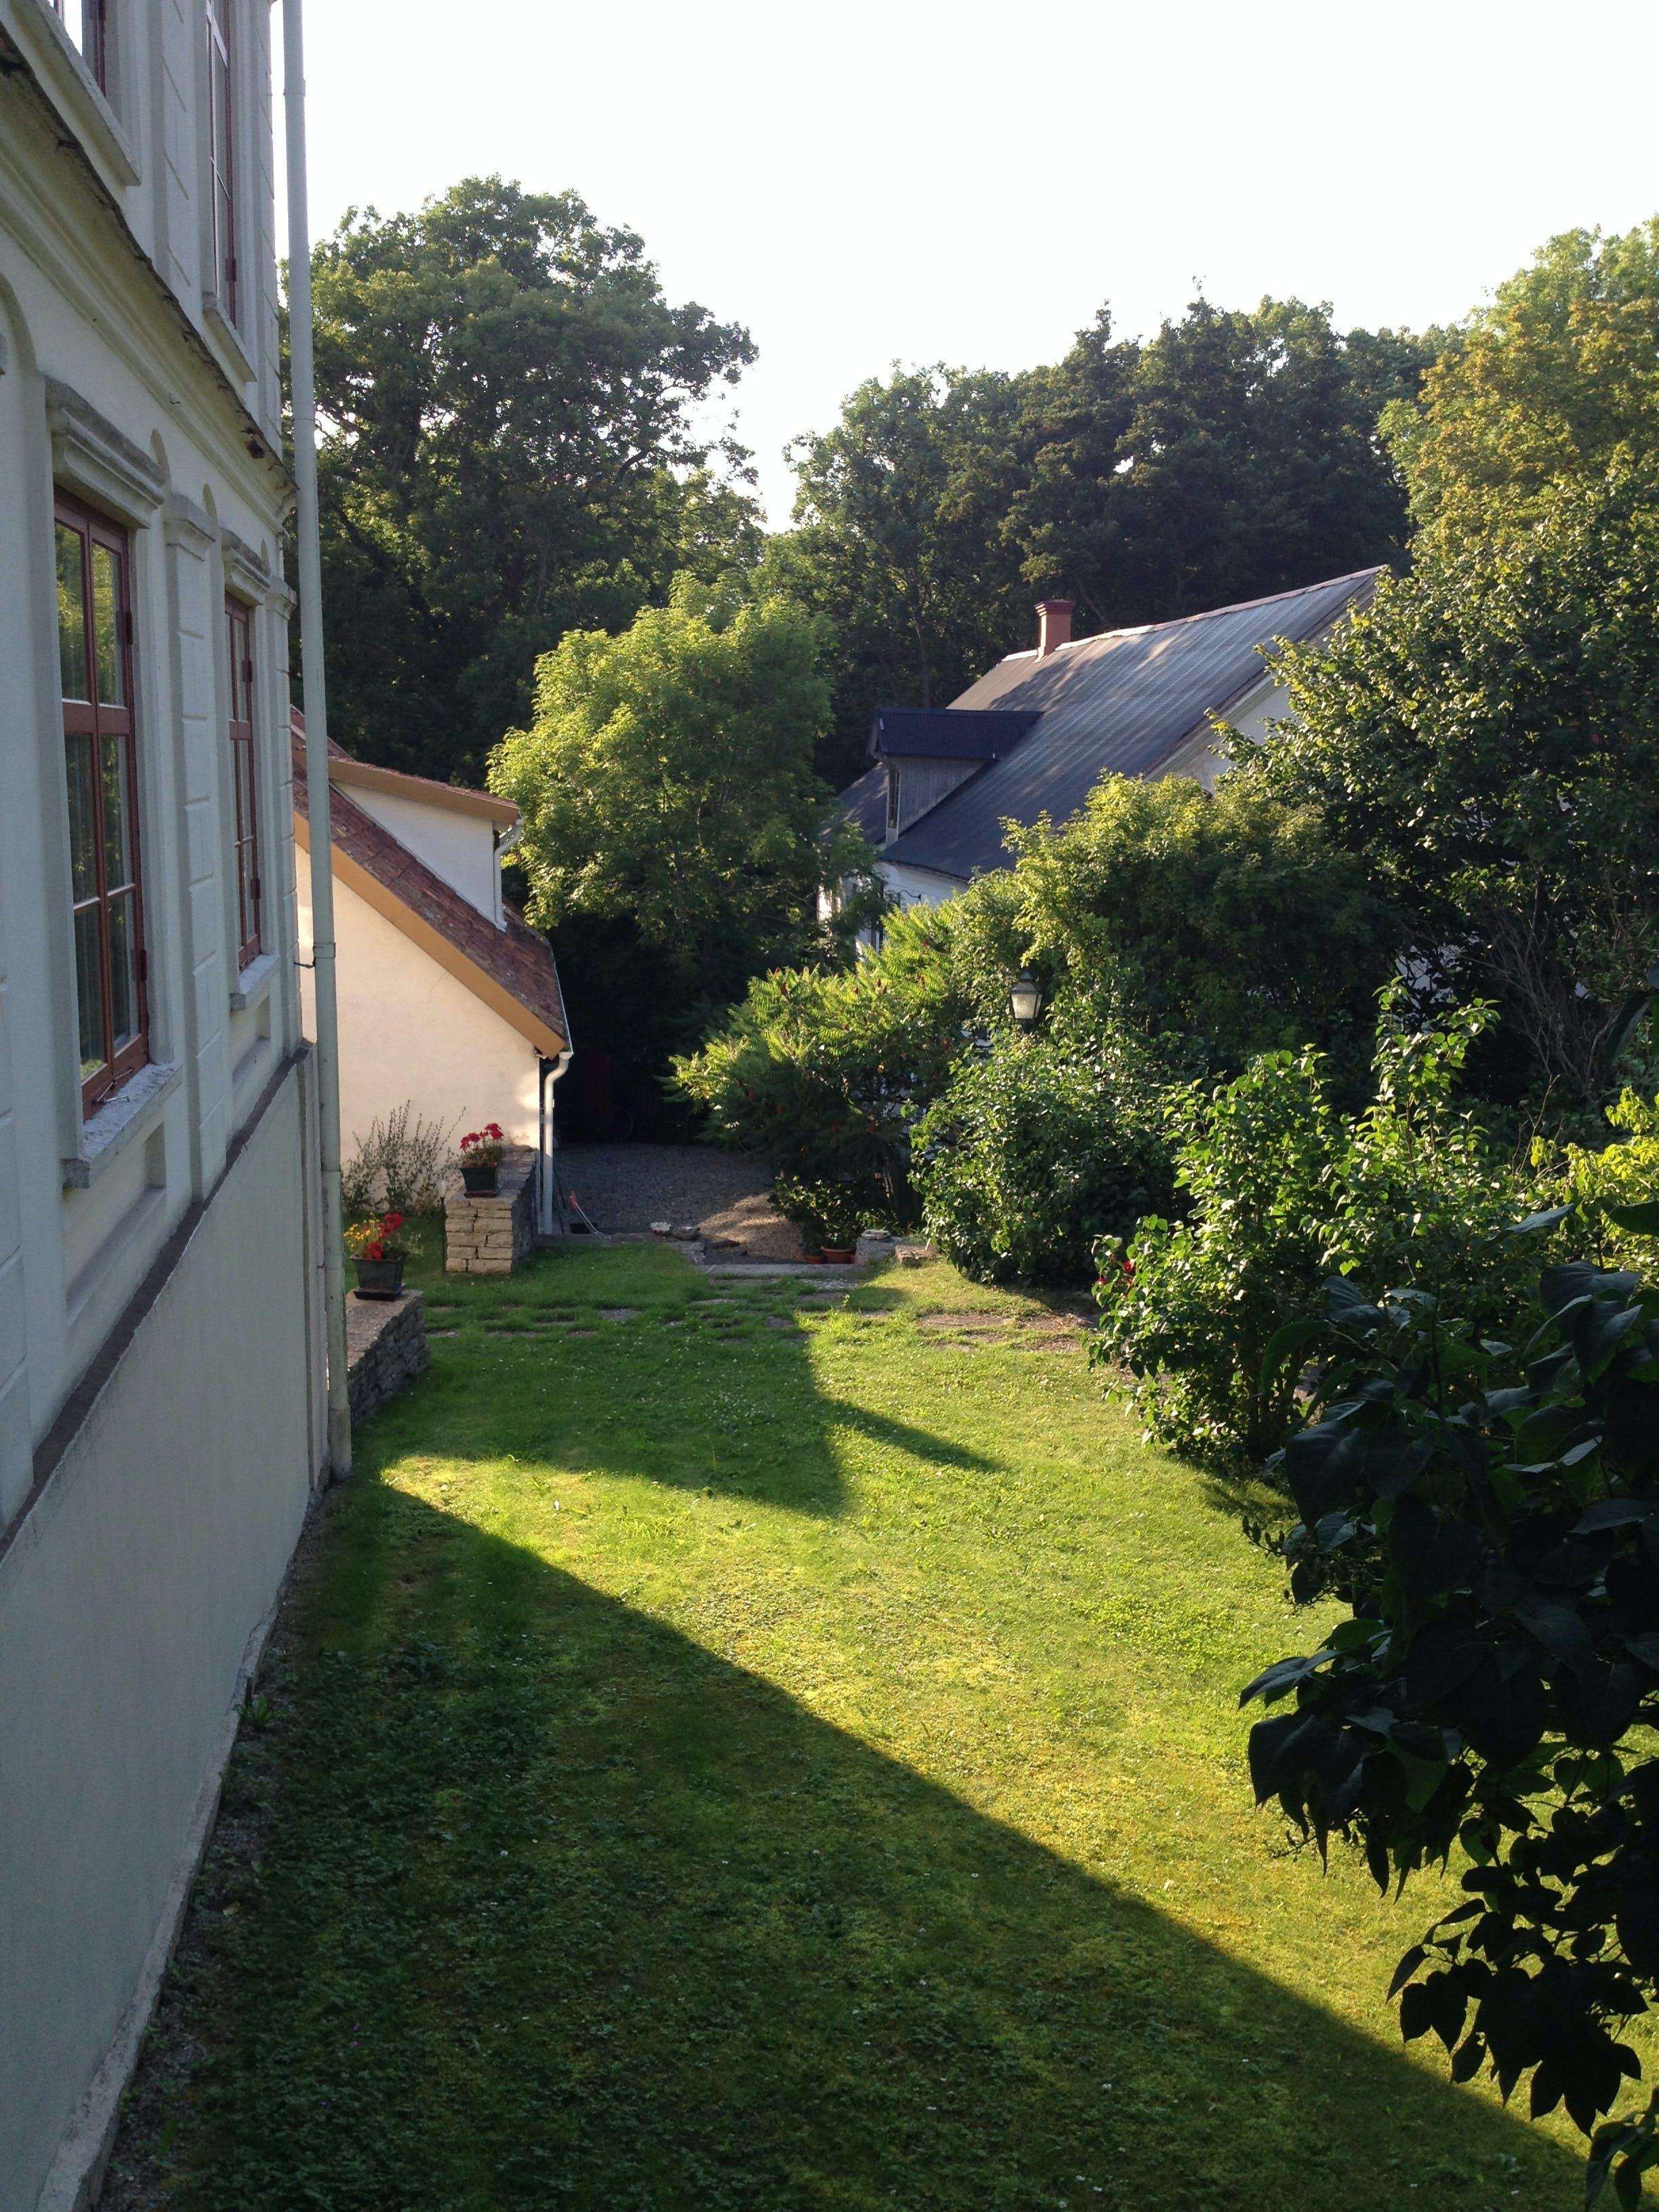 Free stock photo of Gotland, houses, summer